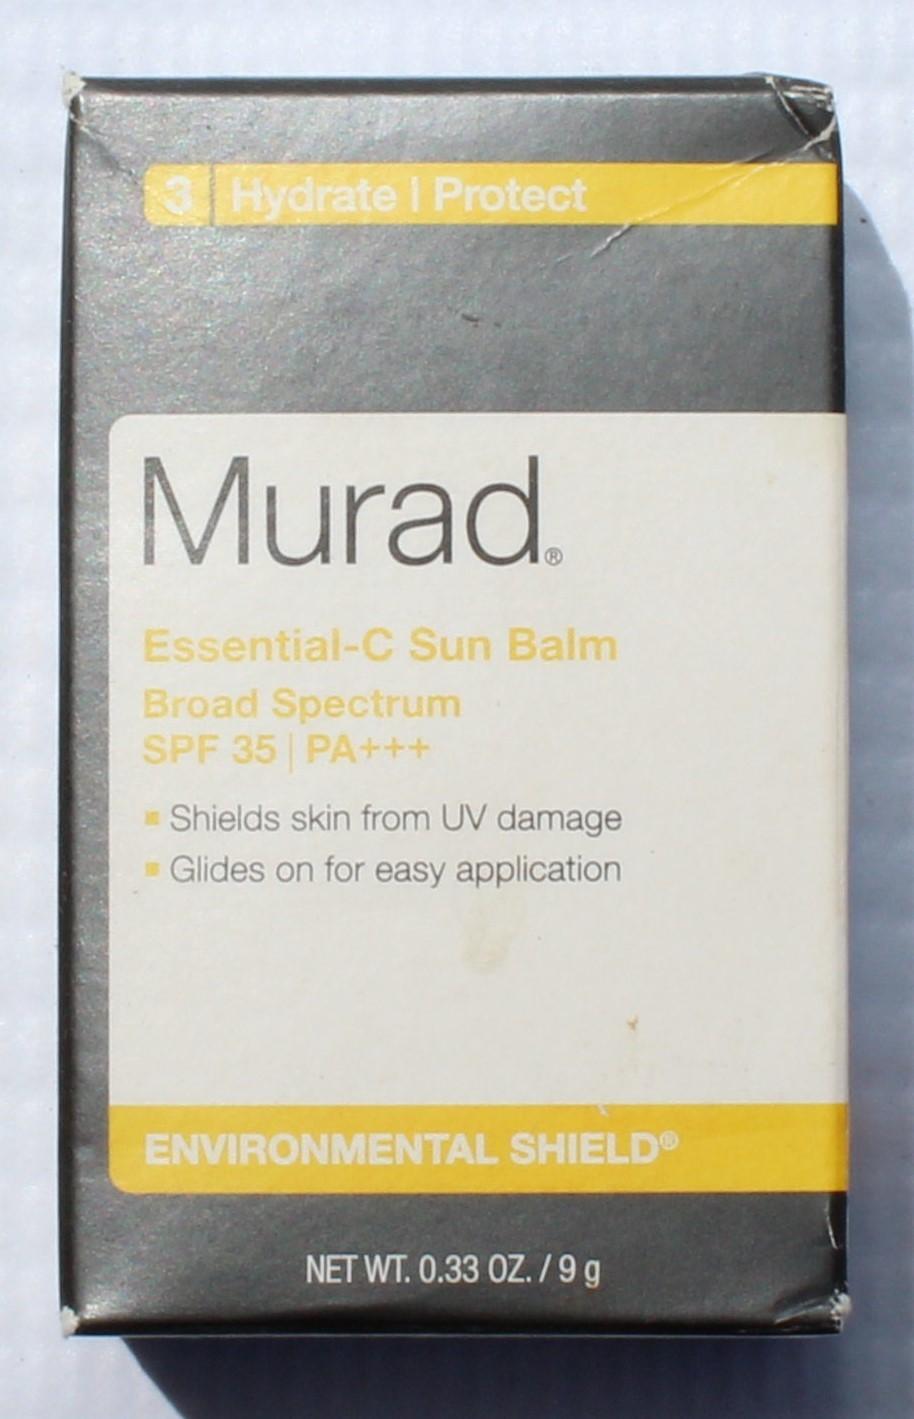 Essential-C Sun Balm SPF 35